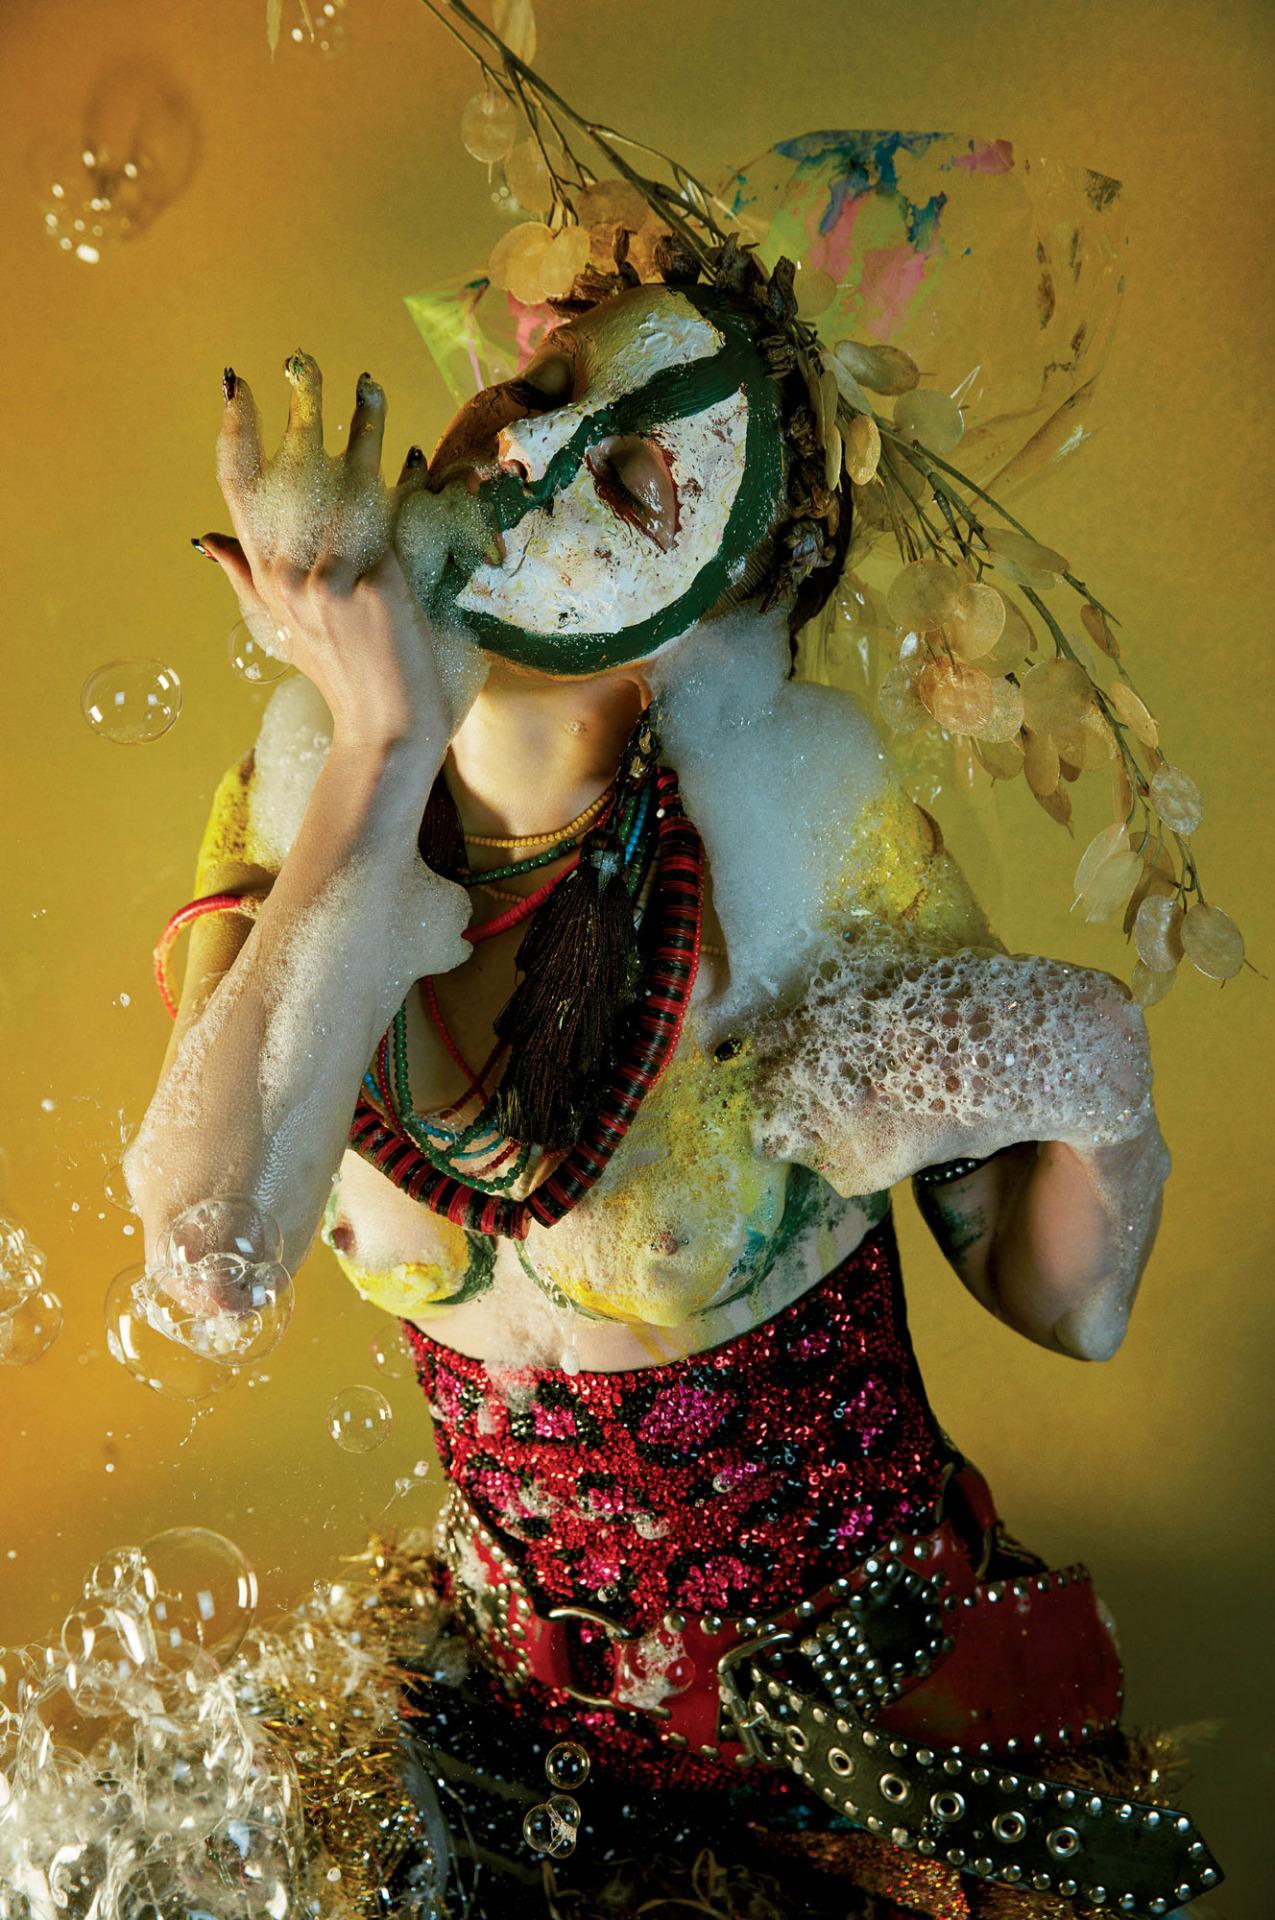 Jungle Beat / V Magazine September 2016 - Ali Michael / Mario Sorrenti